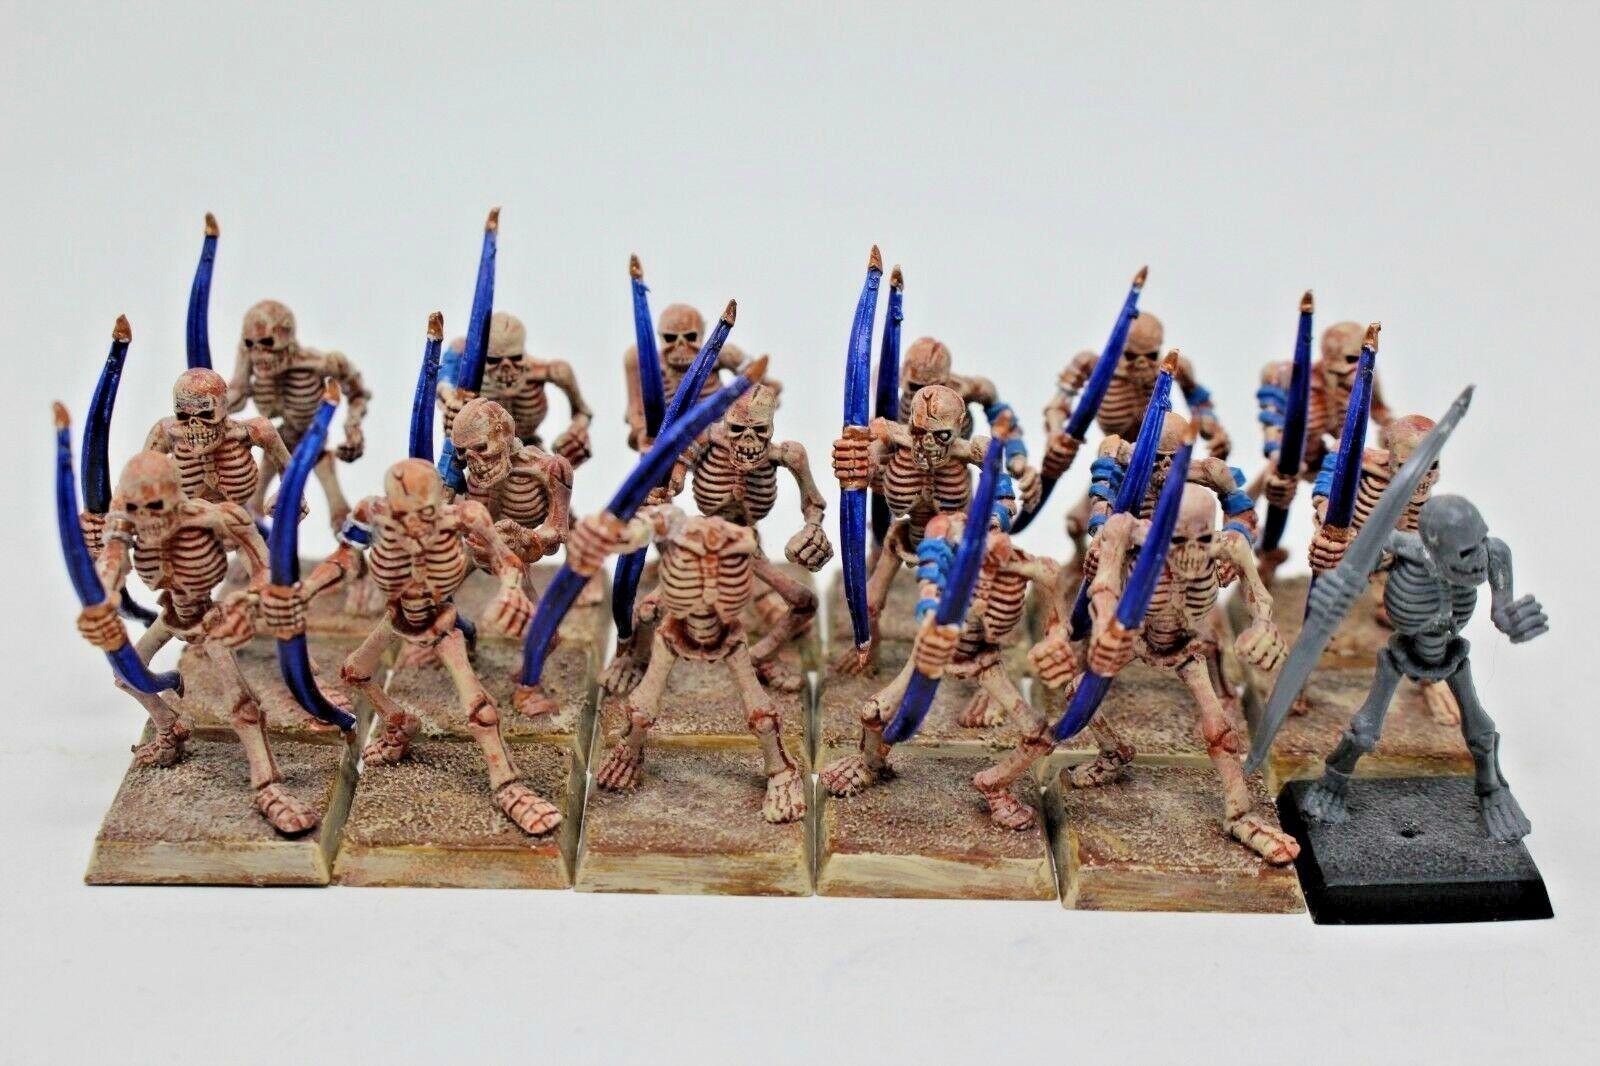 Warhammer grab könige skelett bogenschützen gut gemalt - jsys63